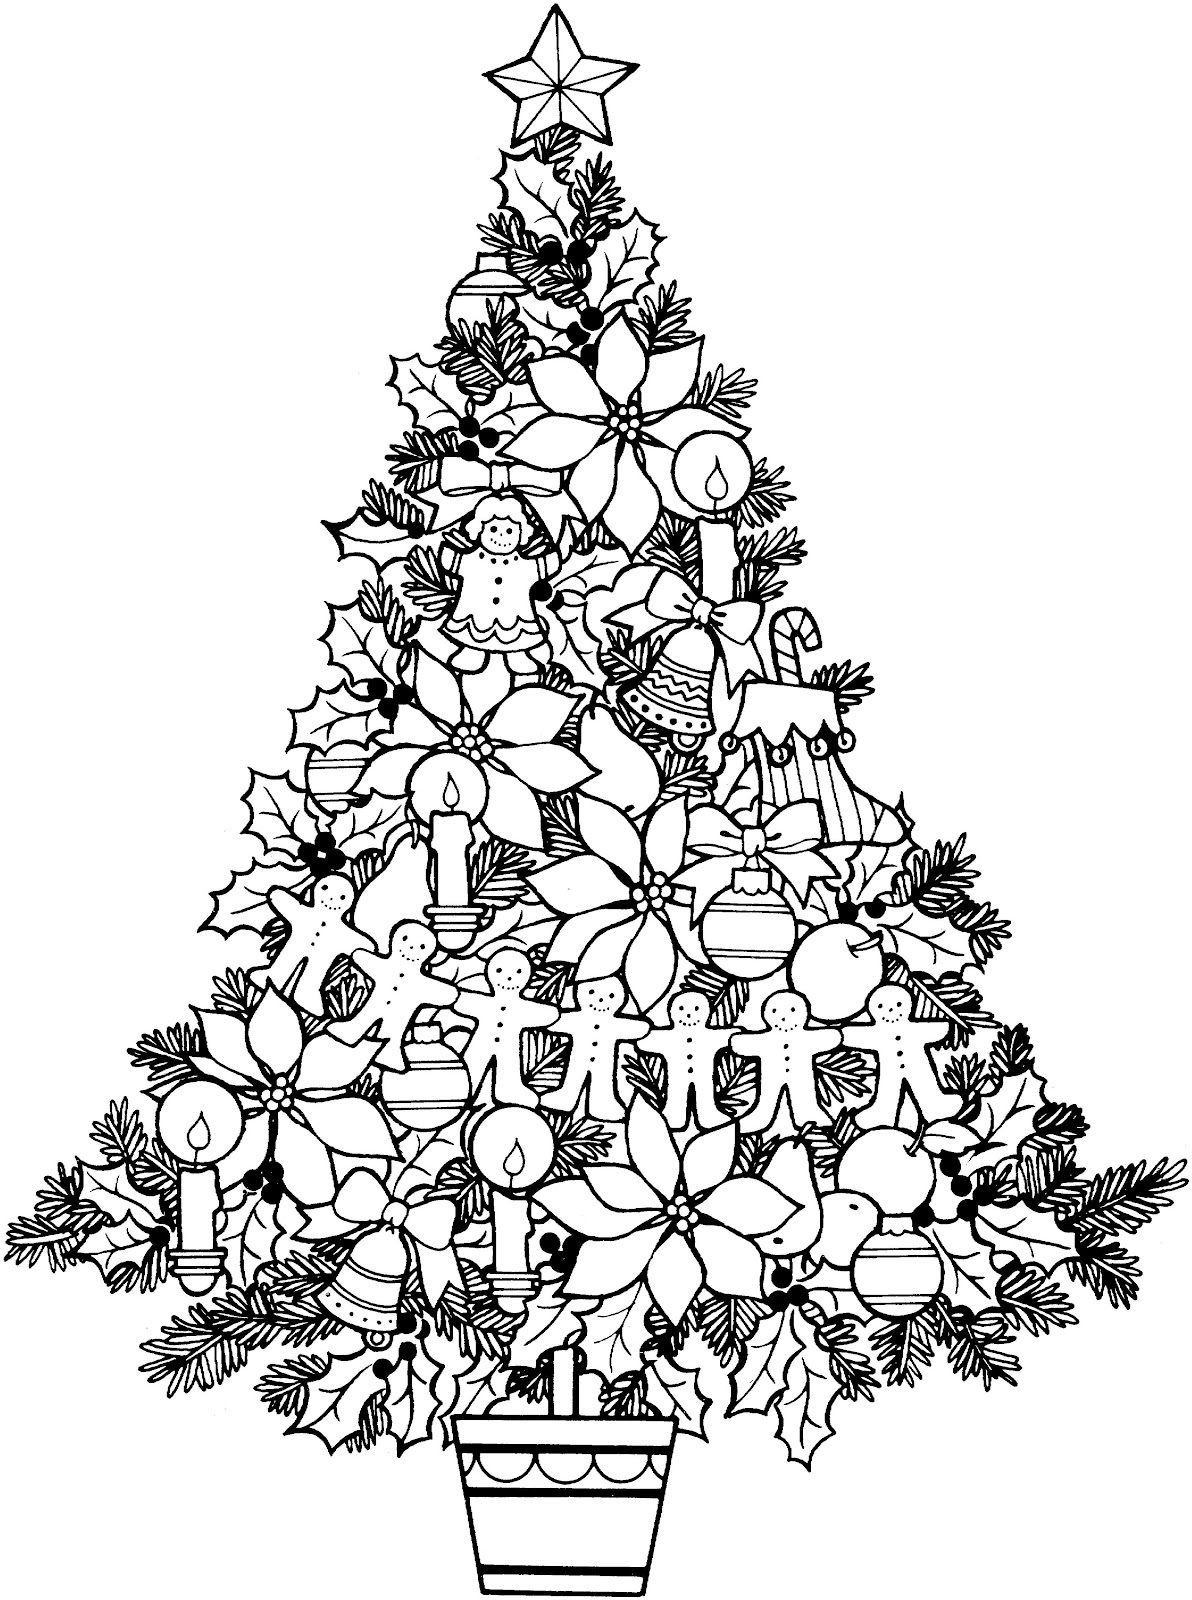 black and white free photos - Christmas Black And White